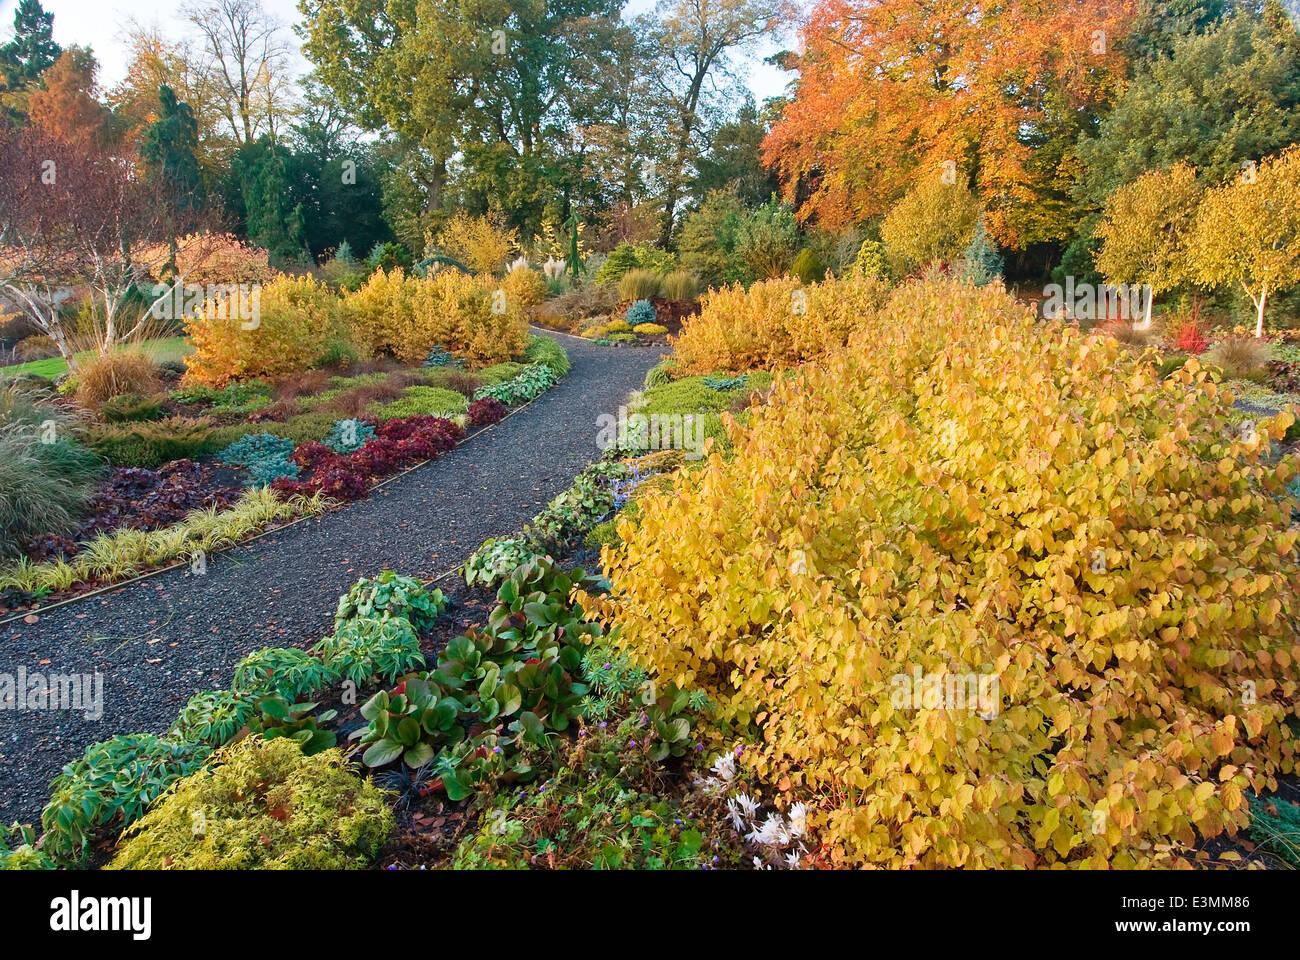 The Winter Garden  in Autumn. Bressingham Gardens, Norfolk, UK, Design: Adrian Bloom. - Stock Image